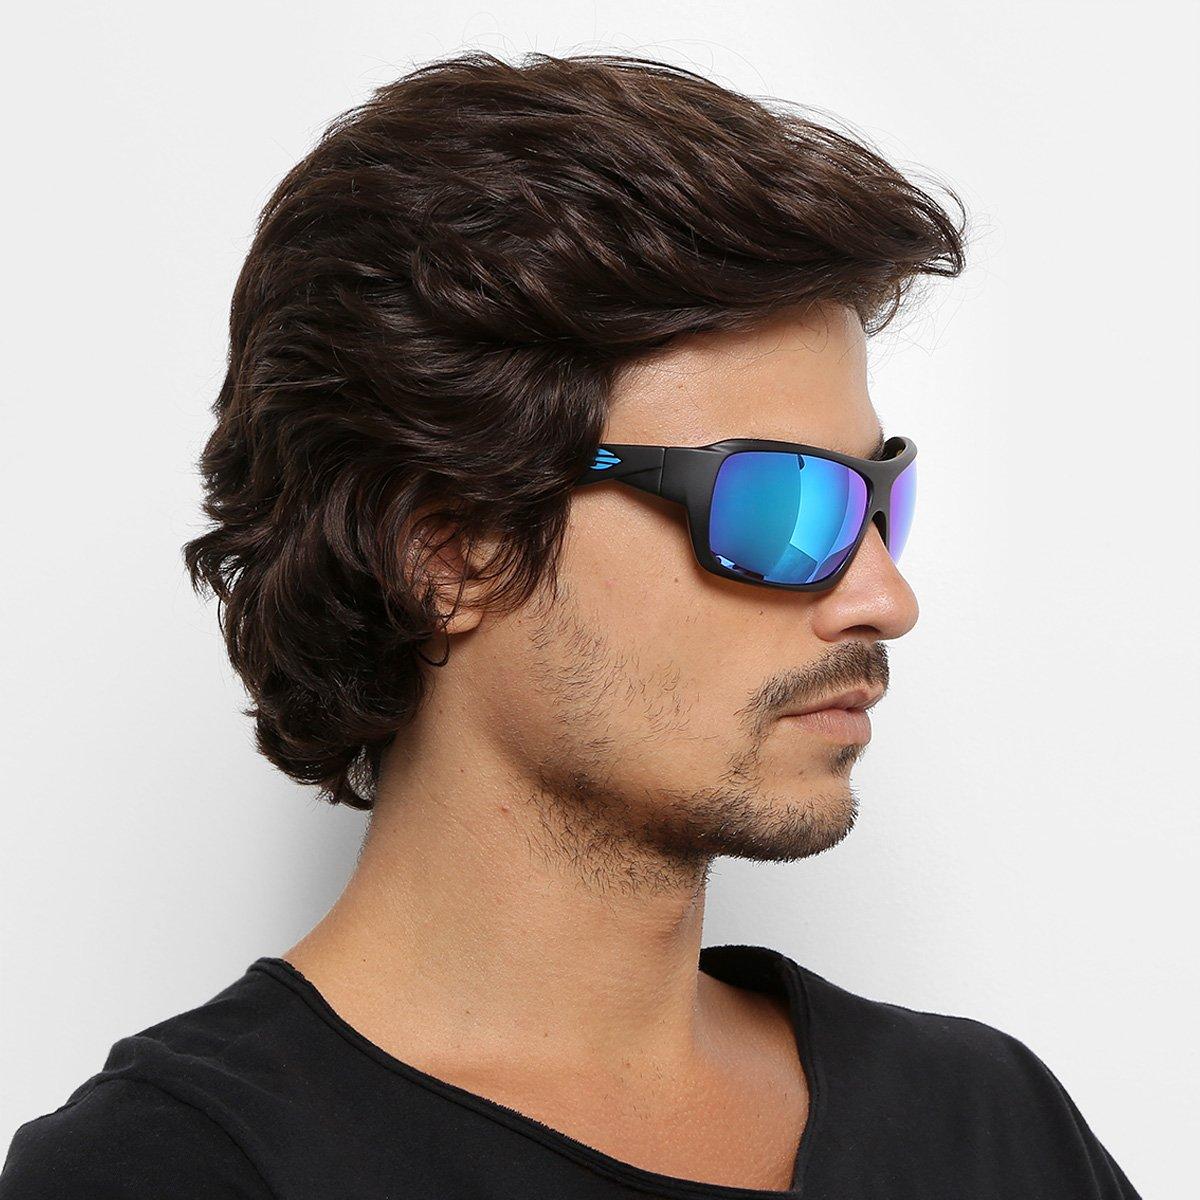 9cc38b6d0daef Óculos de Sol Mormaii Malibu Masculino - Compre Agora   Netshoes